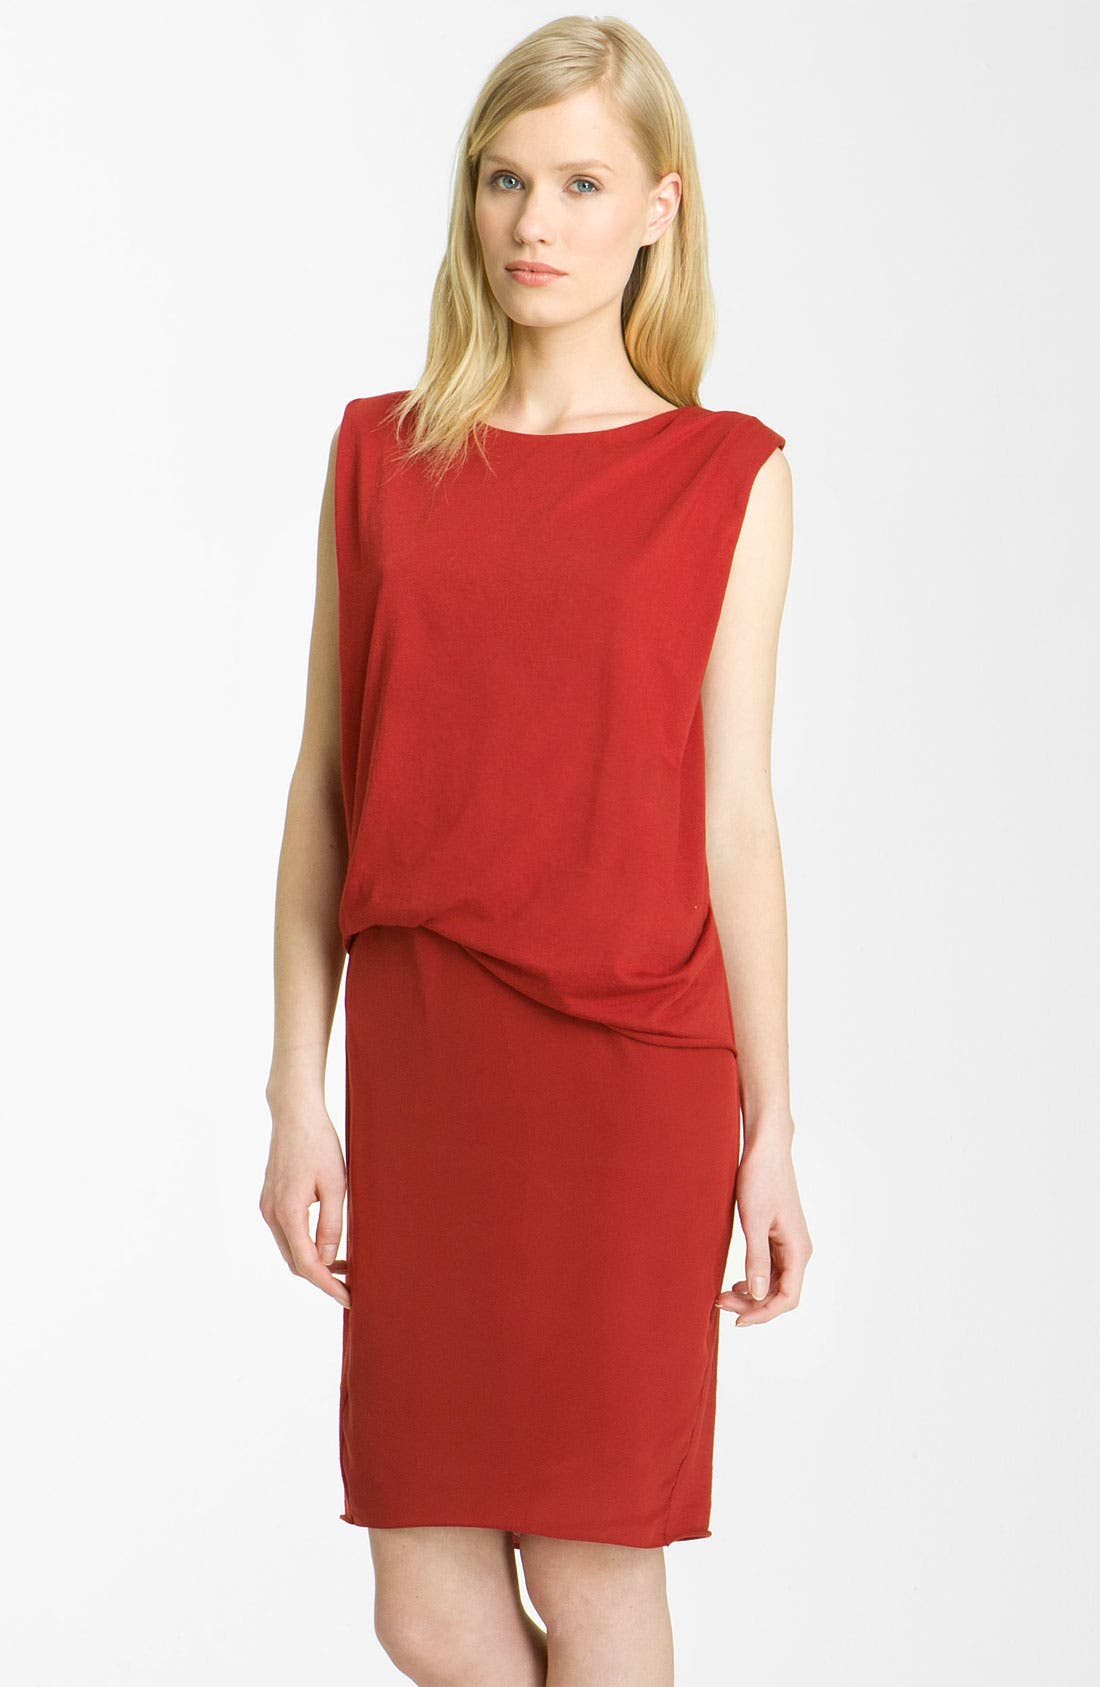 Alternate Image 1 Selected - 3.1 Phillip Lim Knit Dress